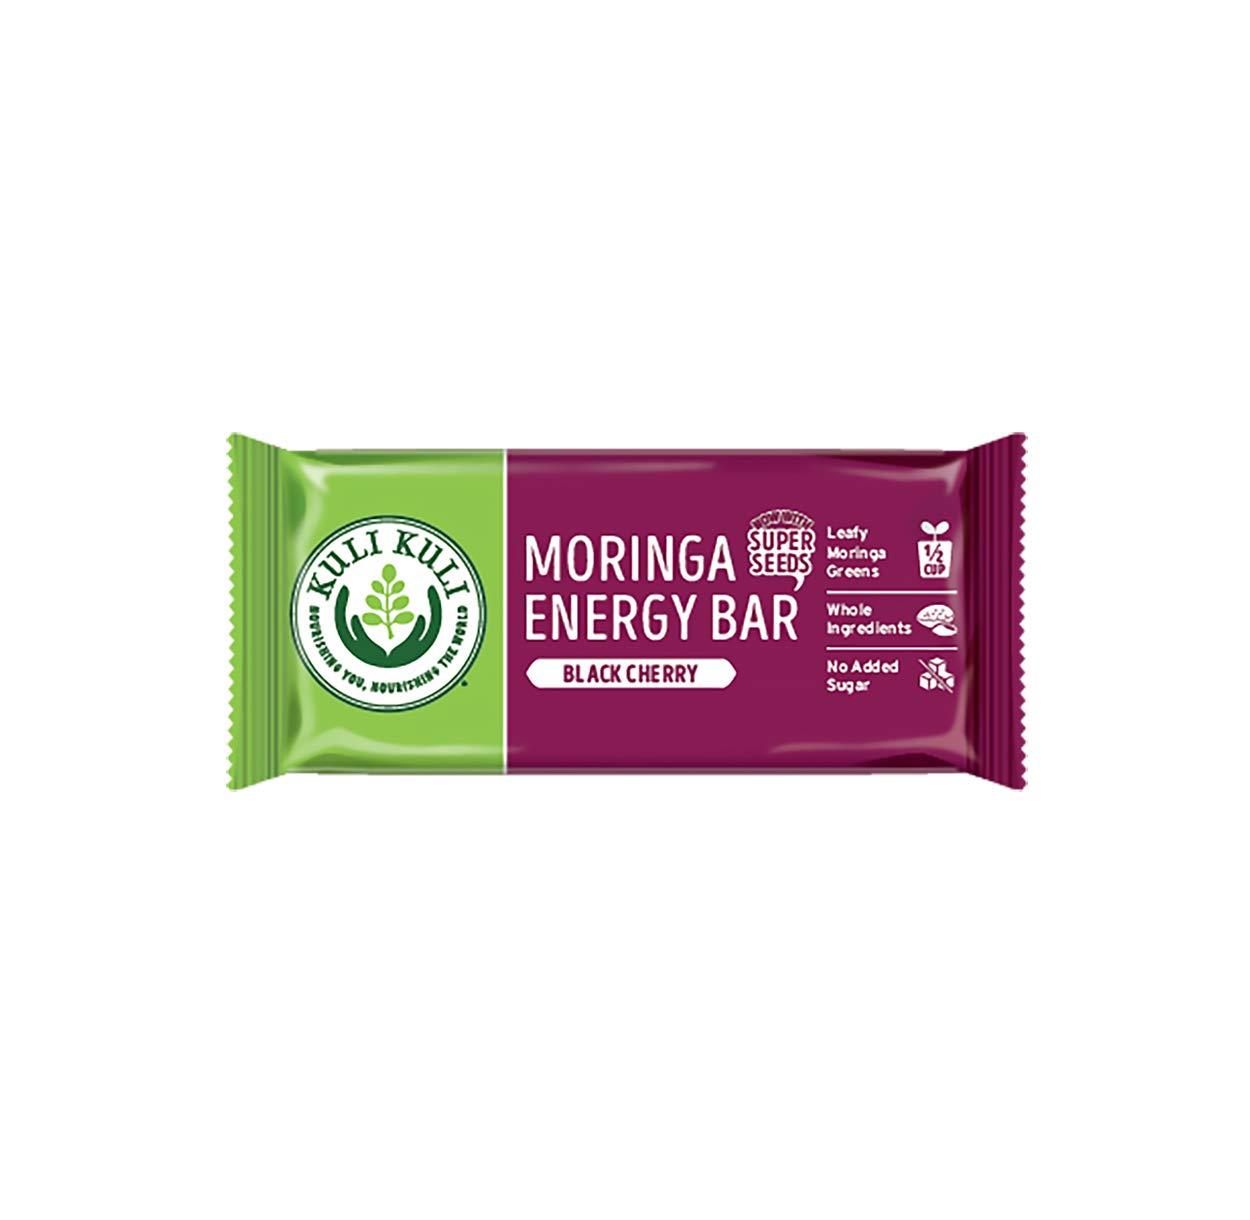 Kuli Kuli Moringa SuperFood Energy Bar, Black Cherry, 1.6 Ounce Bars (Box of 12) Vegan, Gluten-Free Energy Bar, Contains Half Cup of Leafy Greens, Chia & Pumpkin Seeds No Added Sugar, Convenient Snack by Kuli Kuli